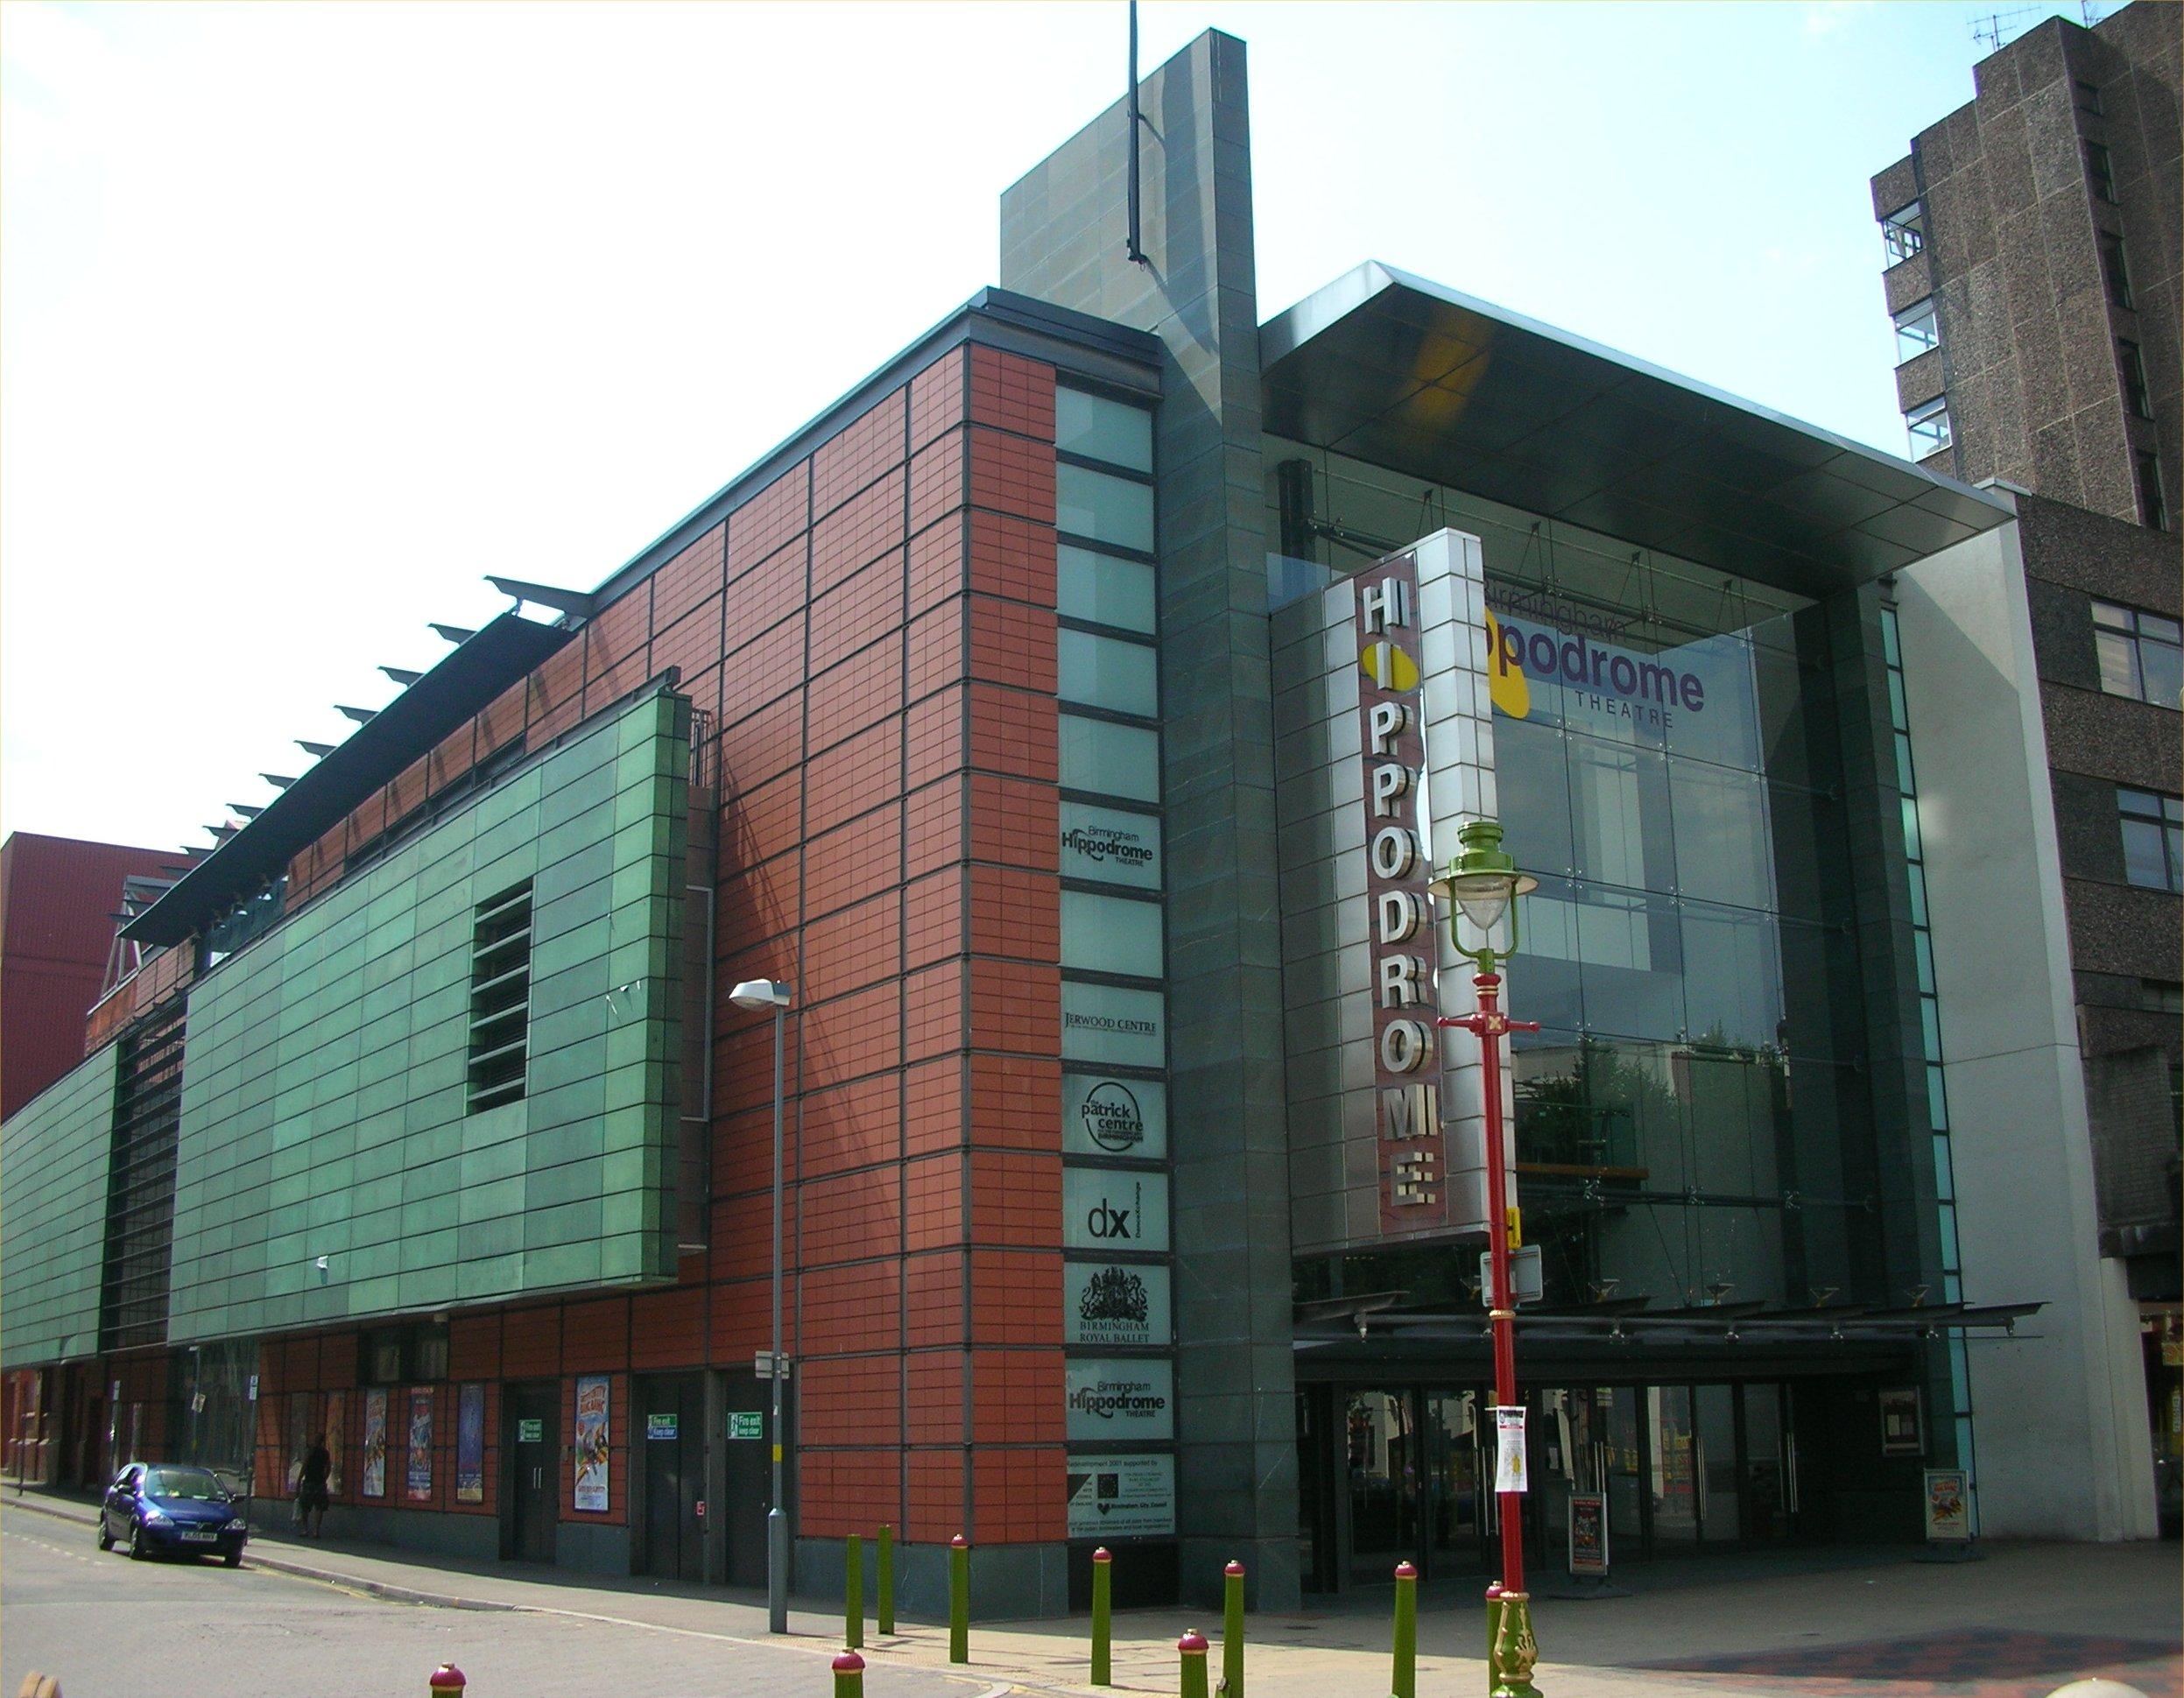 File:Birmingham Hippodrome.jpg - Wikimedia Commons